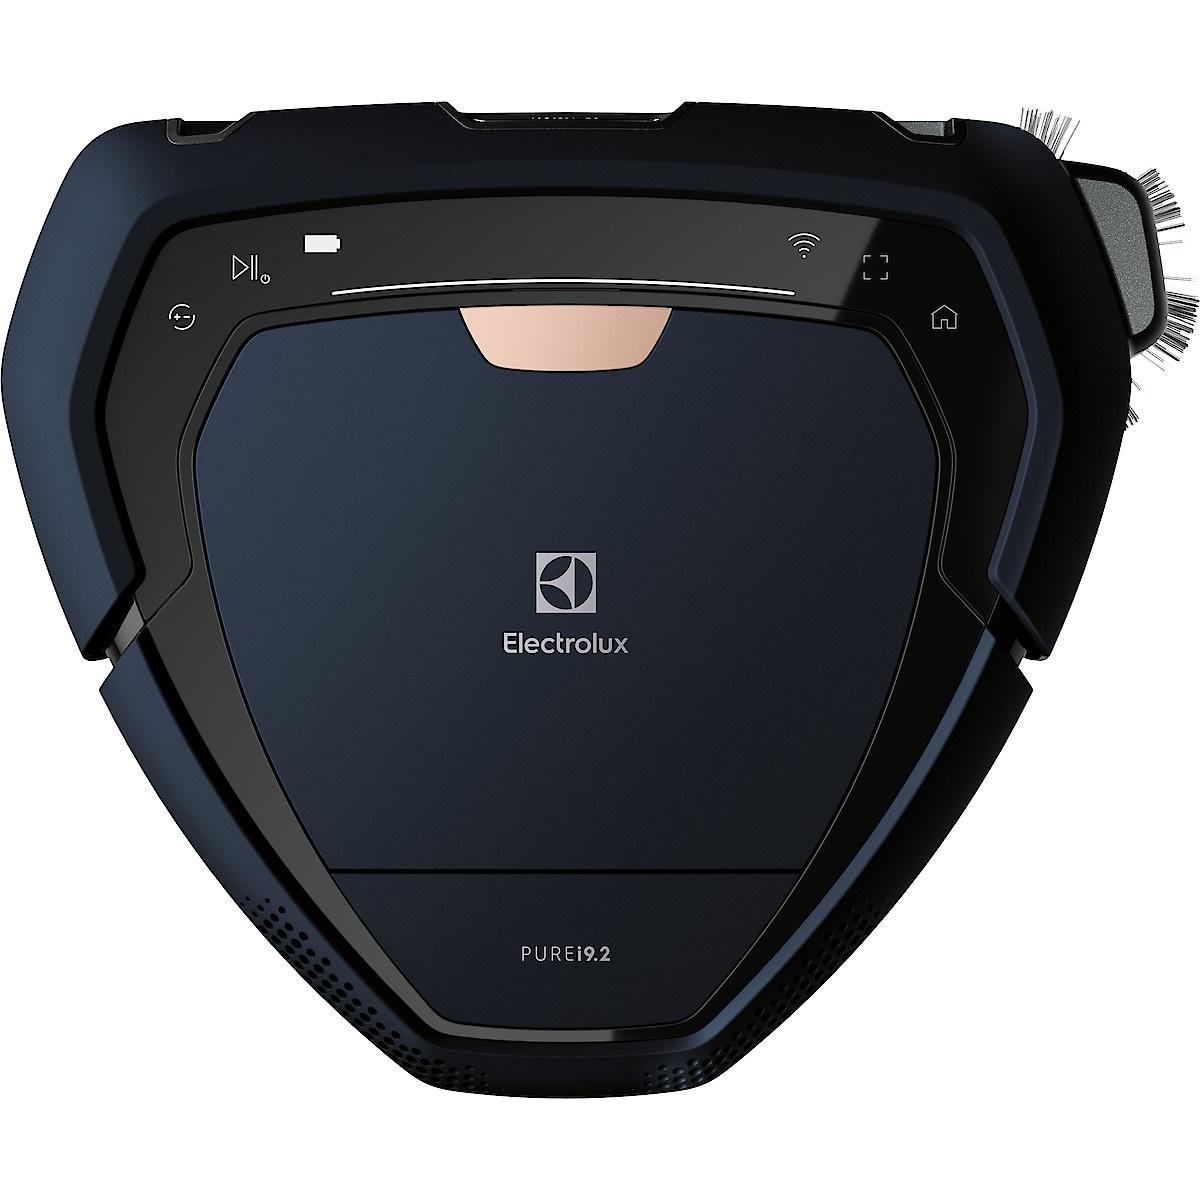 Robotti-imuri Electrolux Pure i9.2